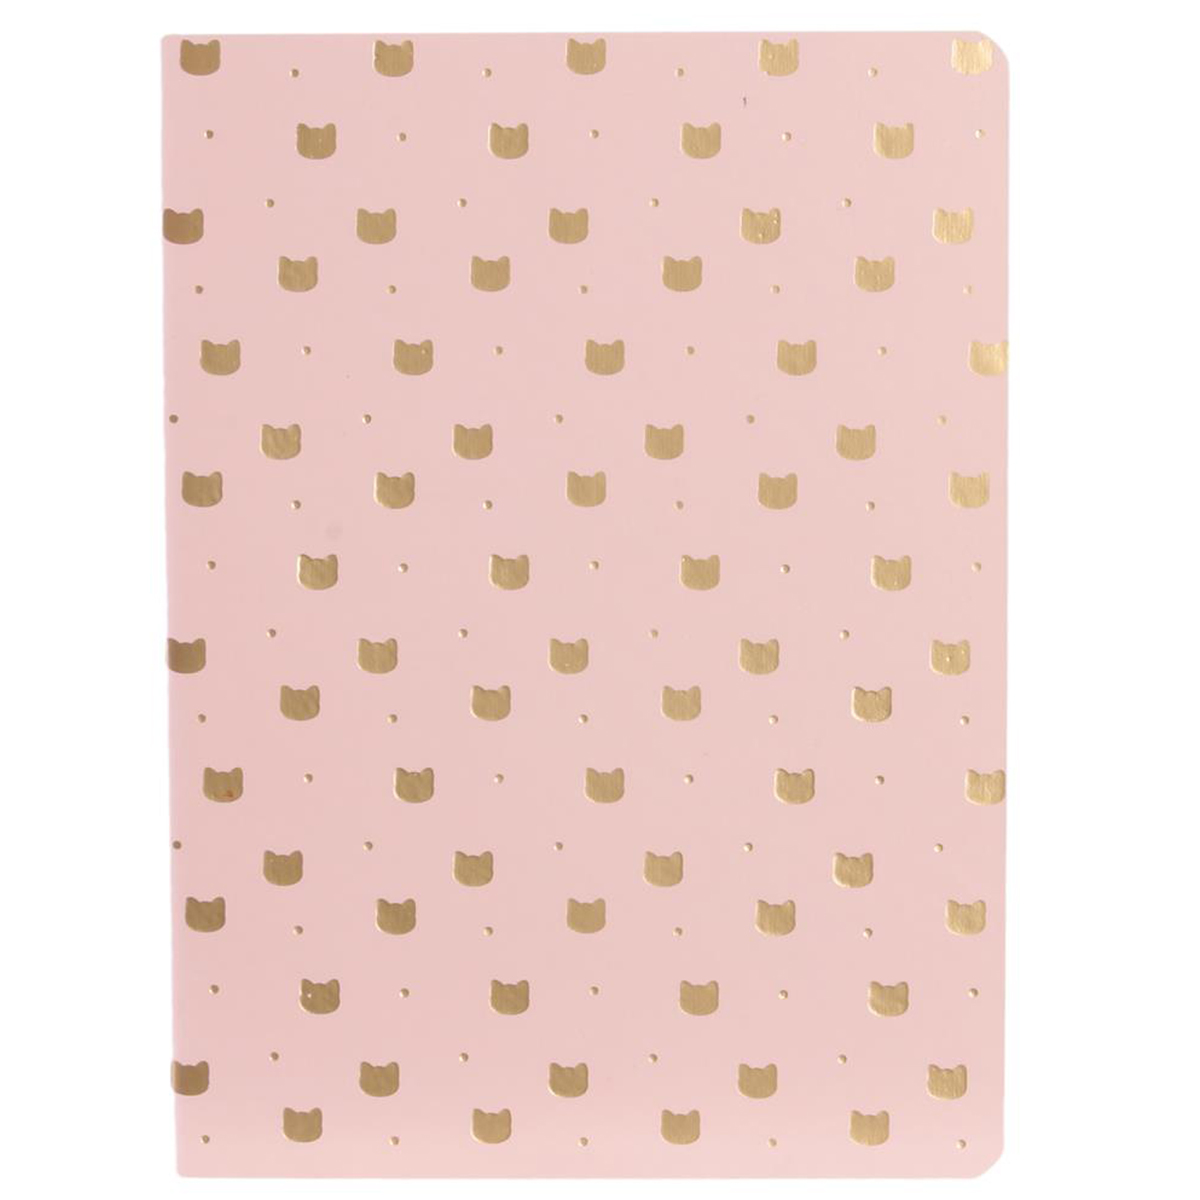 Carnet A6 \'Chats\' rose doré - 15x115x05 cm - [Q5433]